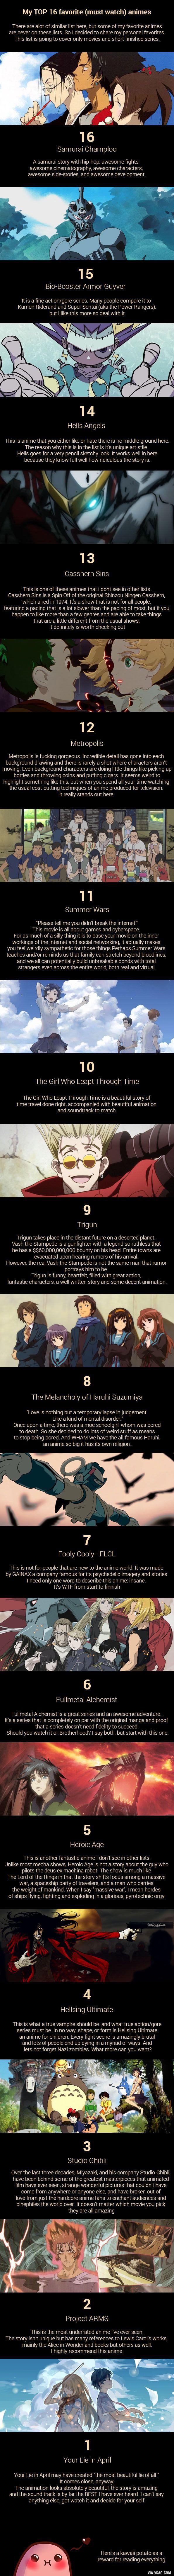 My top 16 must-watch anime list. With short reviews. http://9gag.com/gag/a6L8x2e?ref=fbp